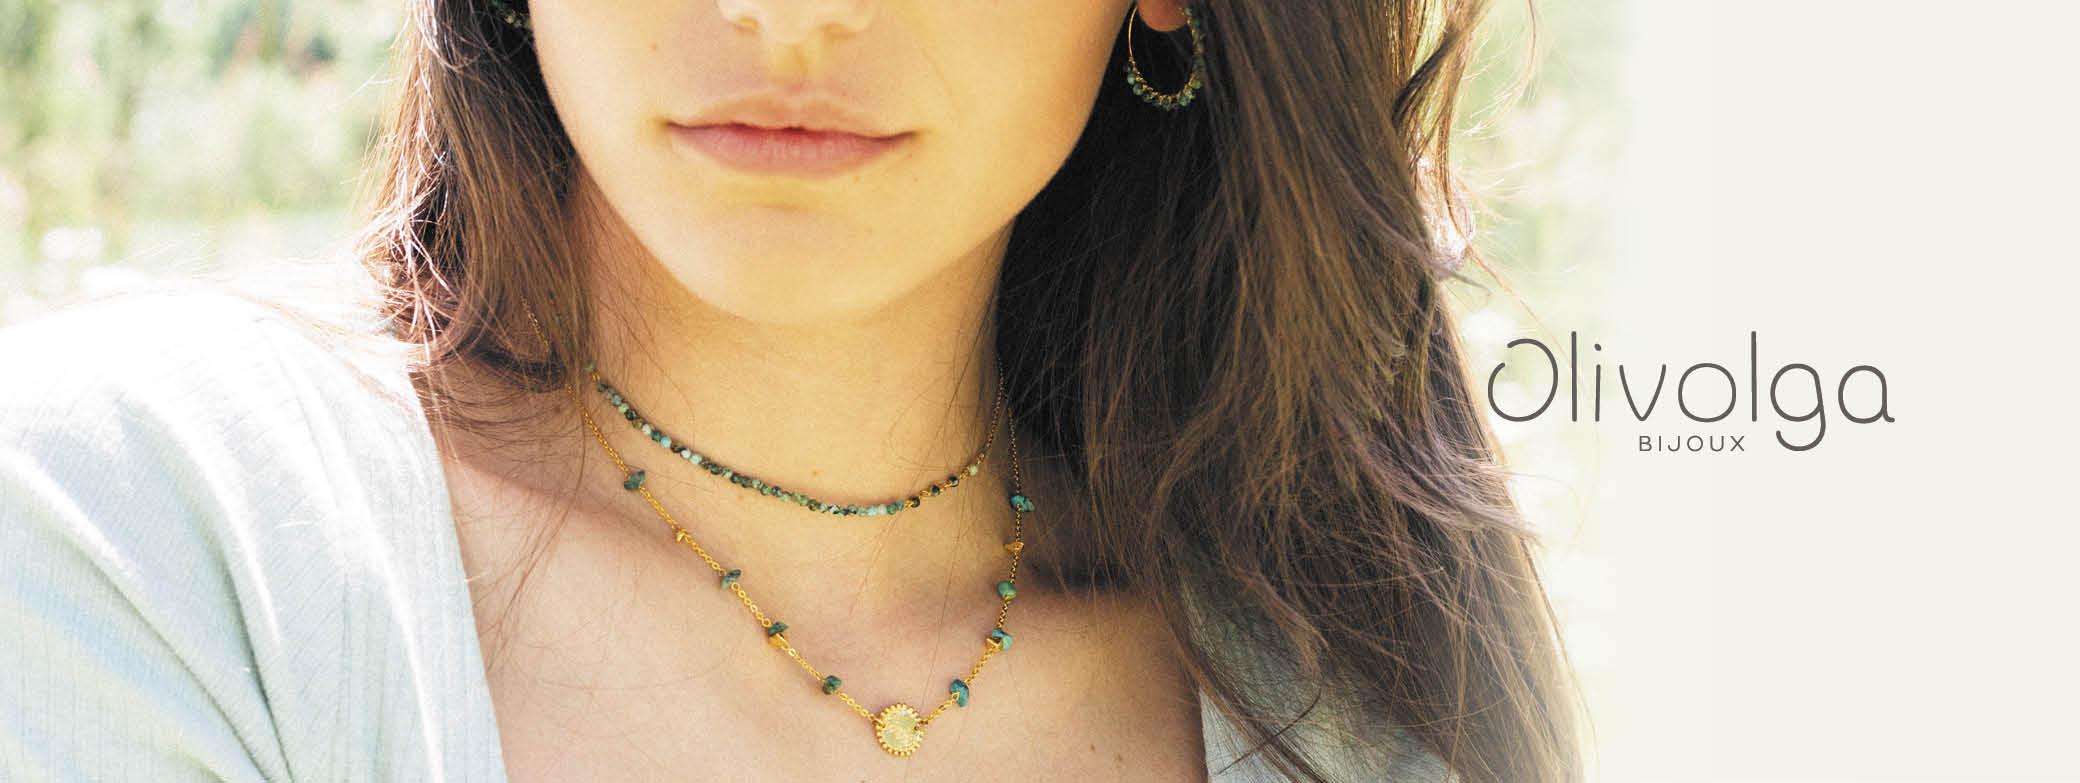 Olivolga bijoux - fashion jewelery with great prices